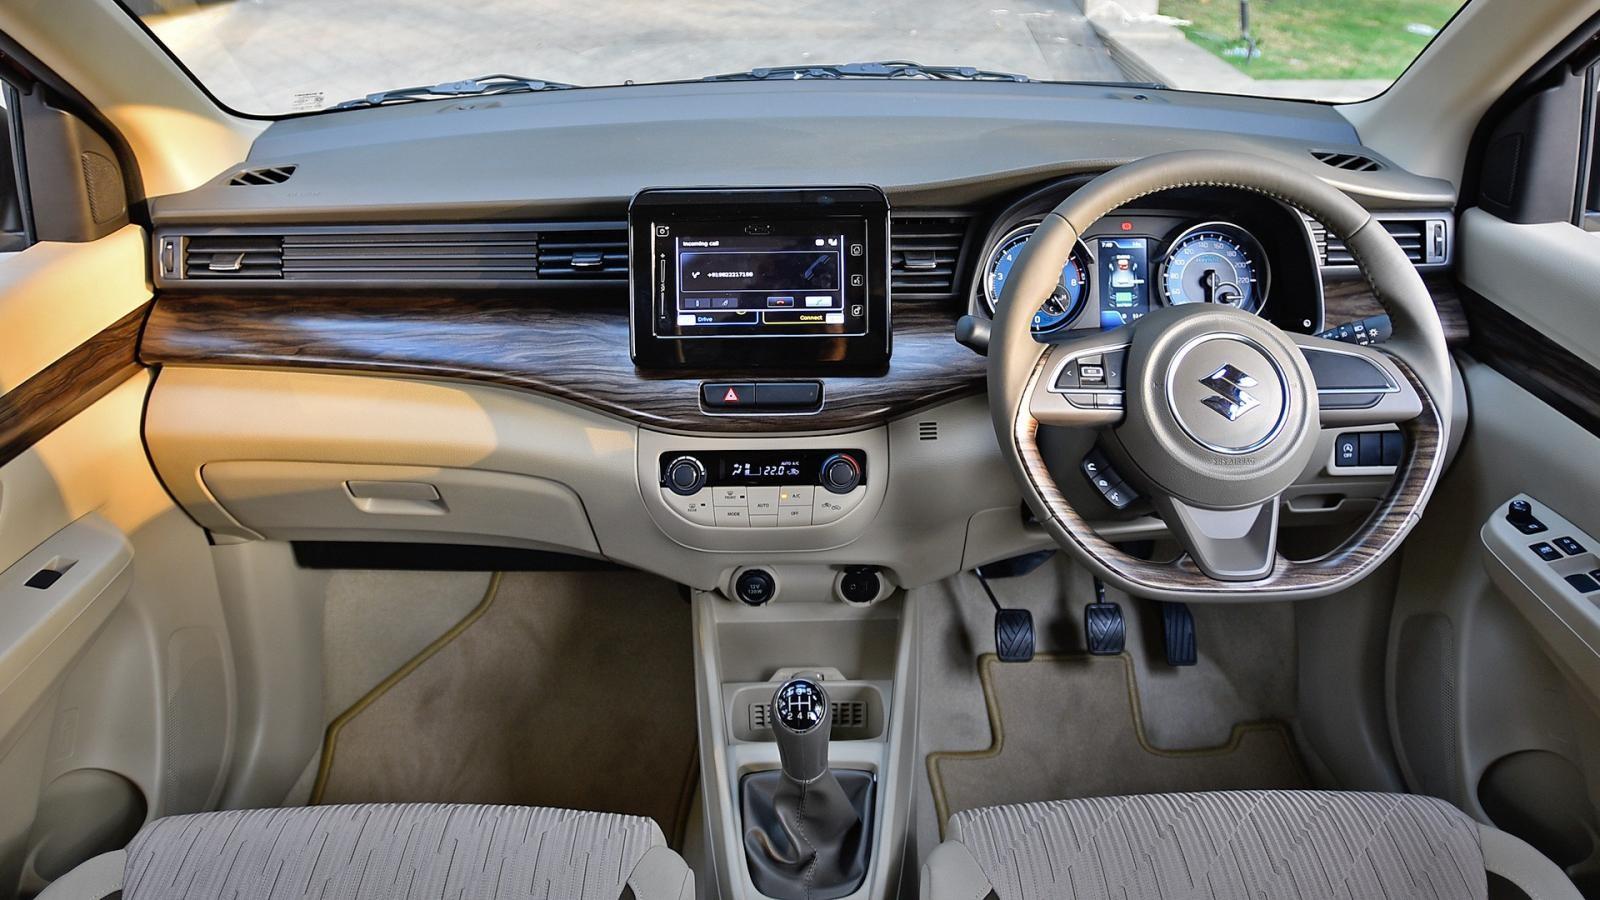 Nội thất mới của Suzuki Ertiga 2019